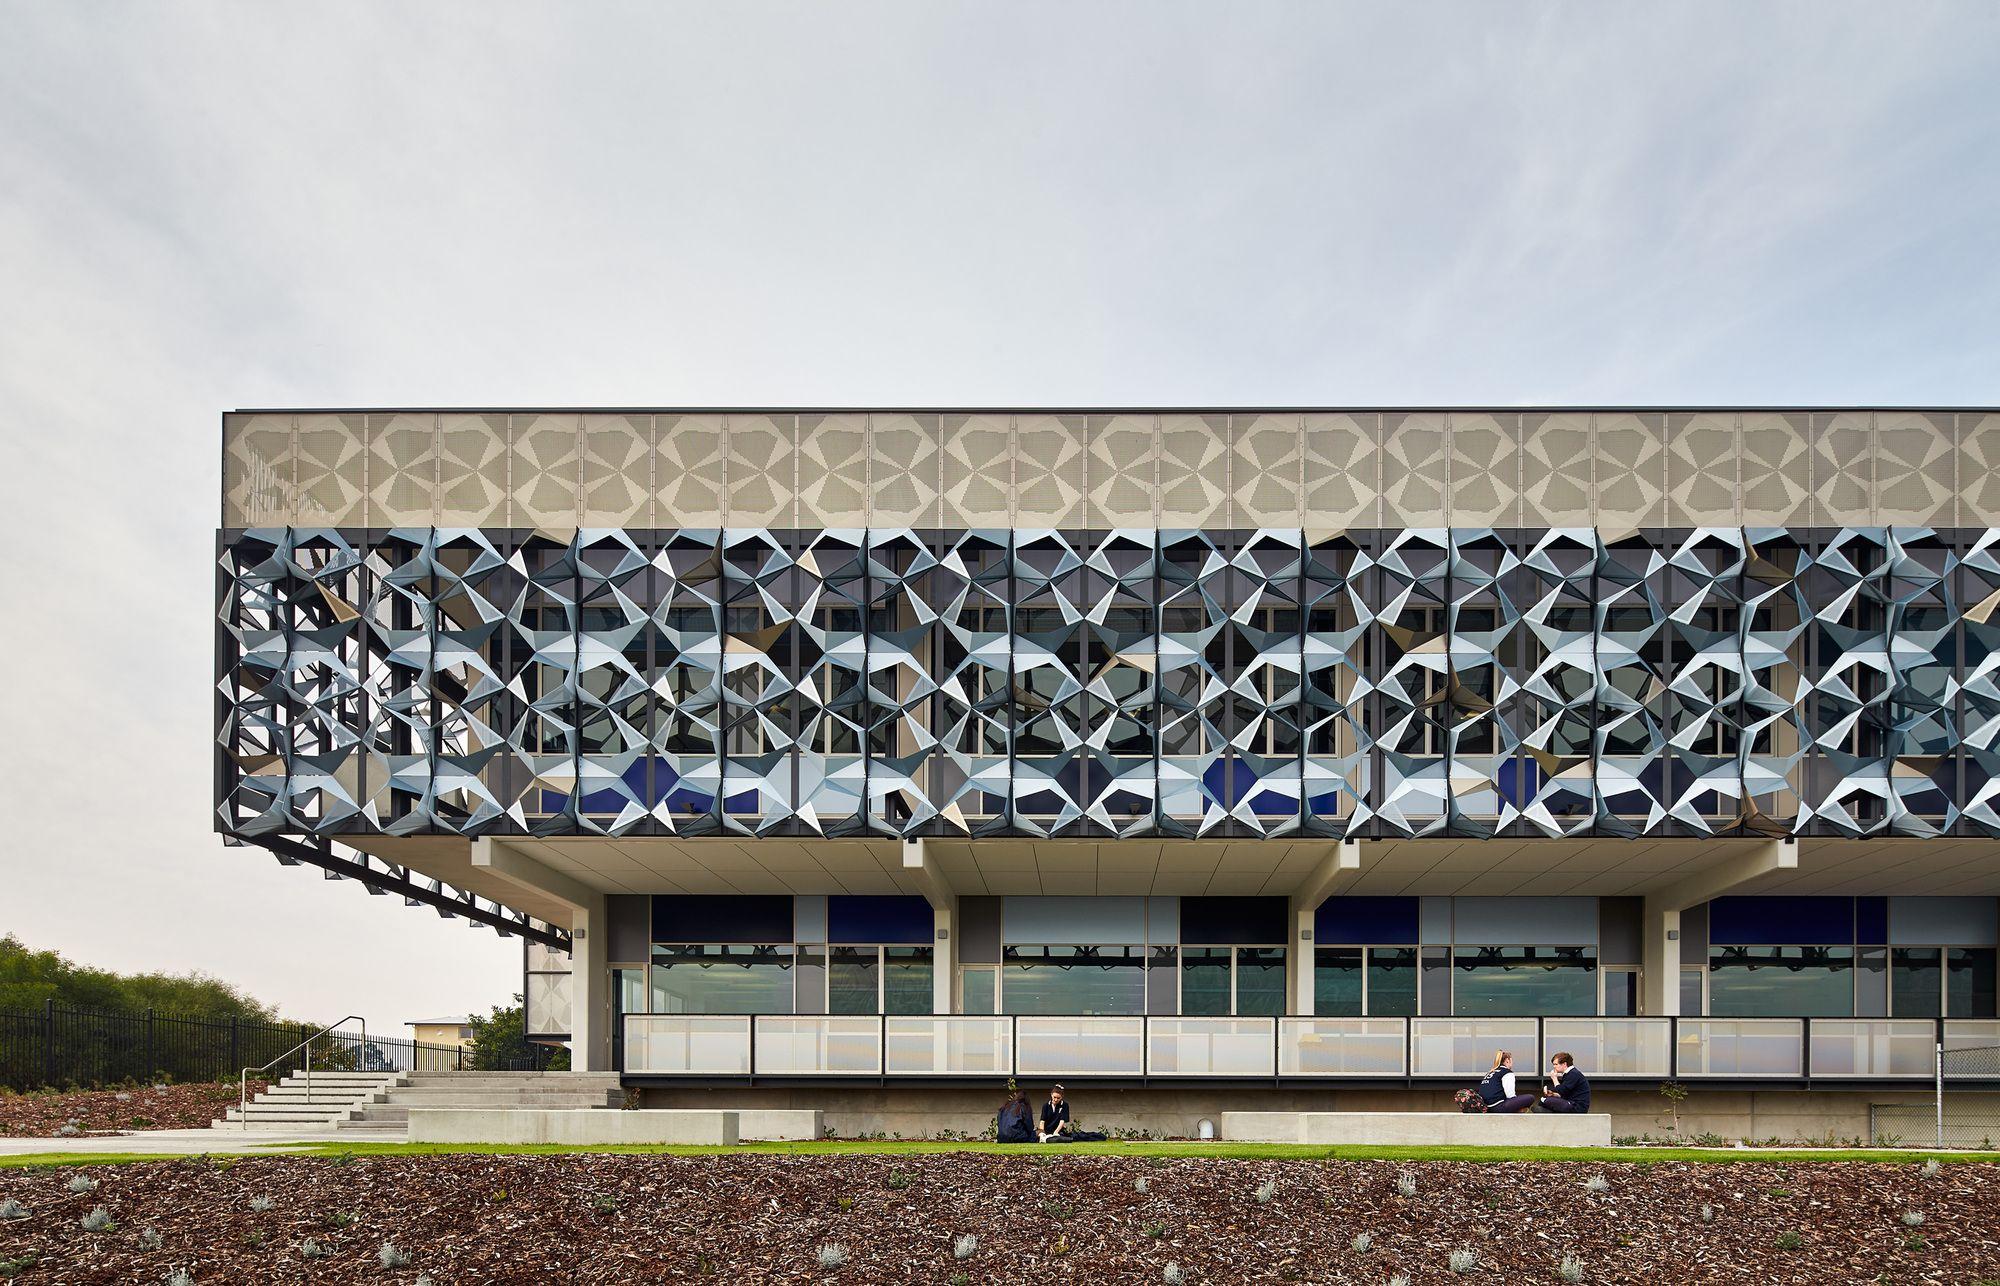 Escola de Artes John Curtin / JCY Architects and Urban Designers